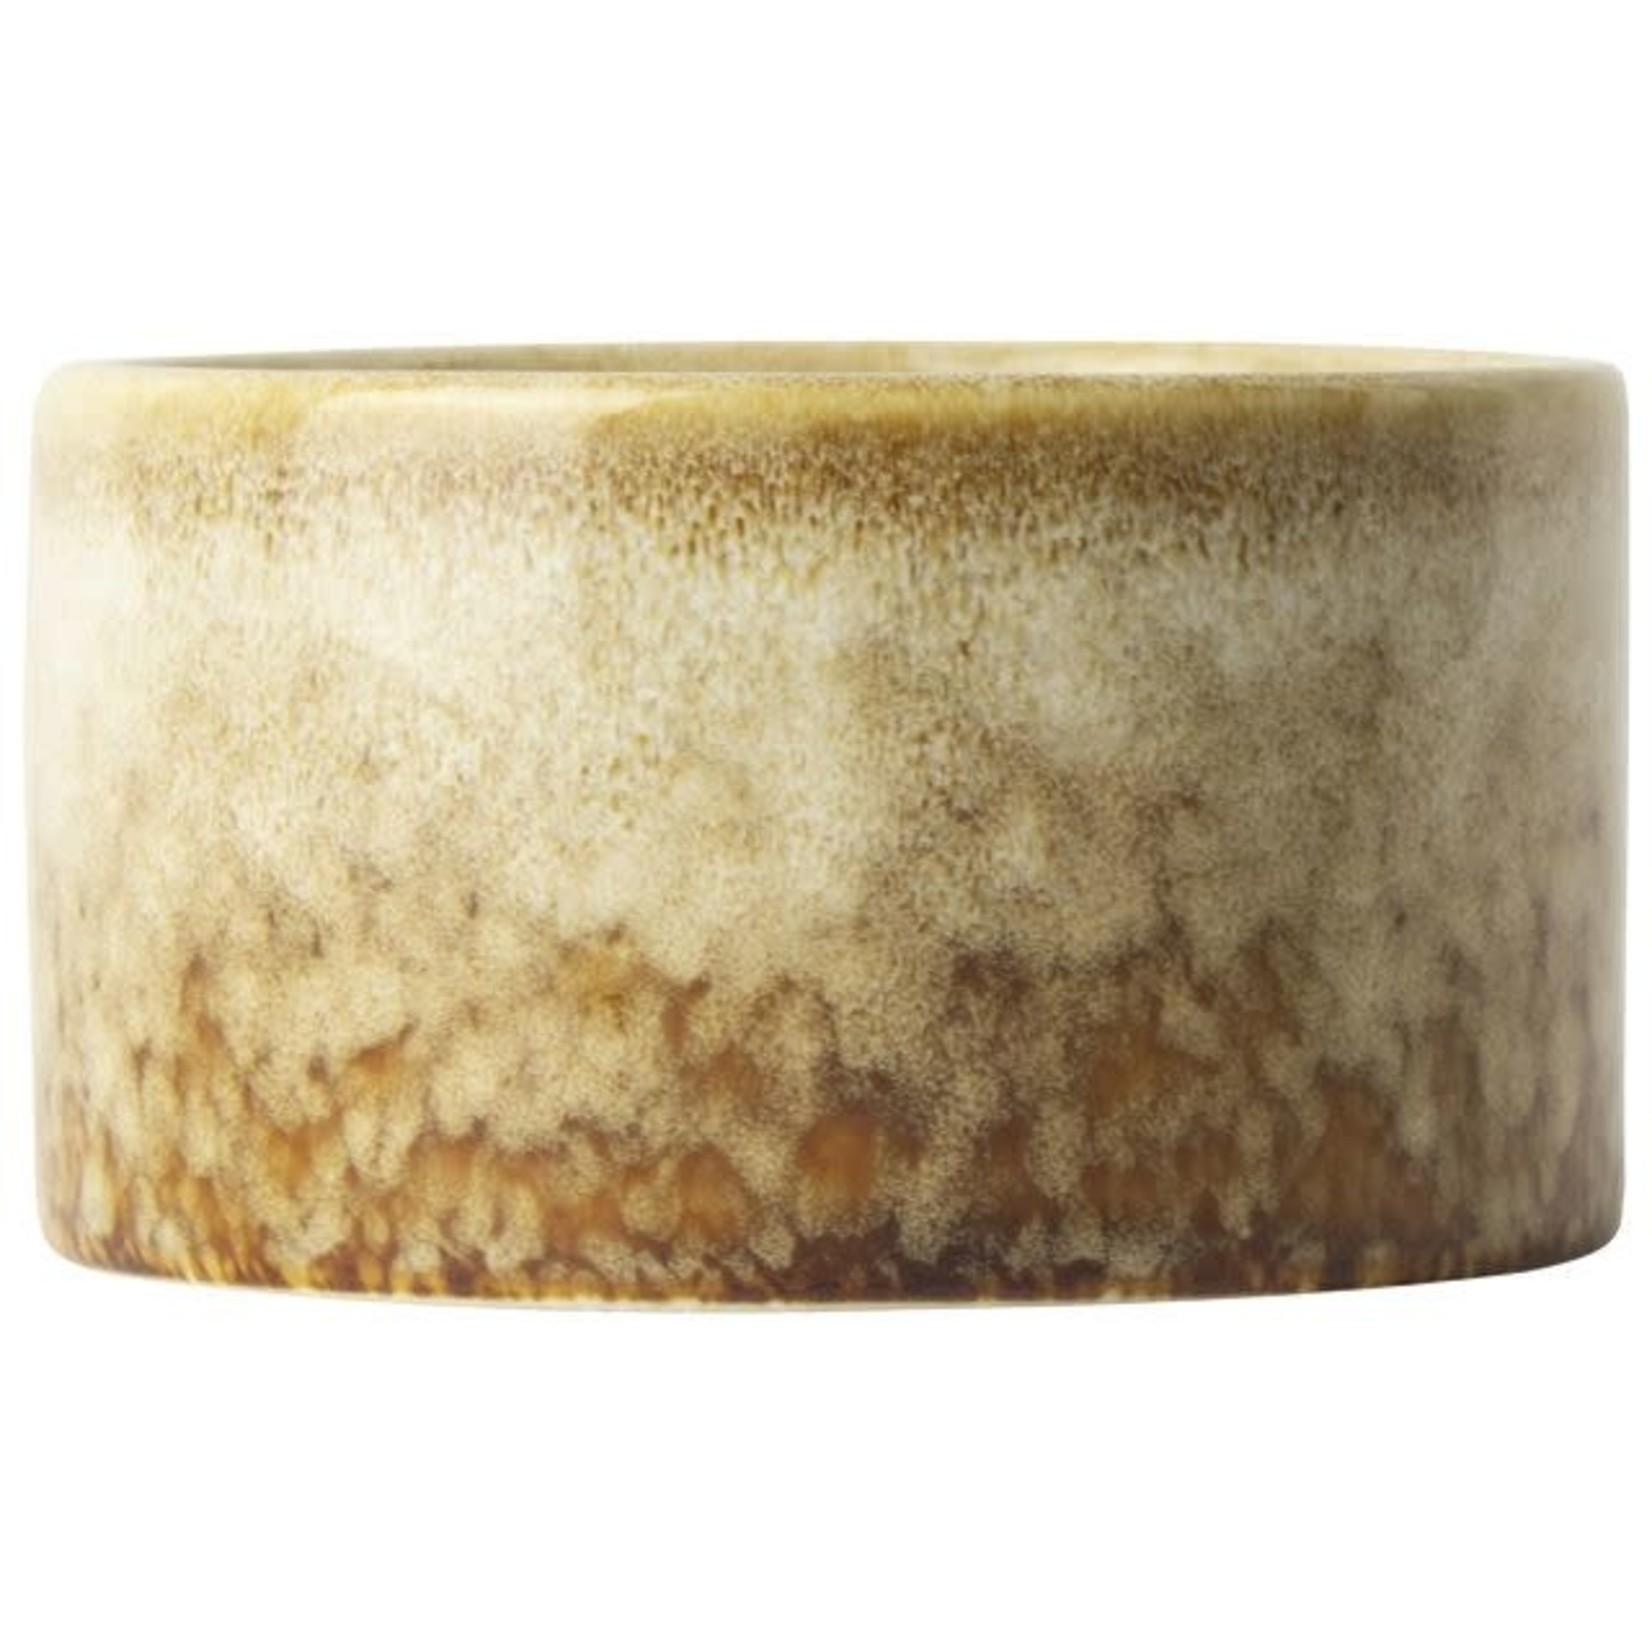 Gusta Kaars in keramiek pot ø8,6xH4,9cm Bruin/Oker